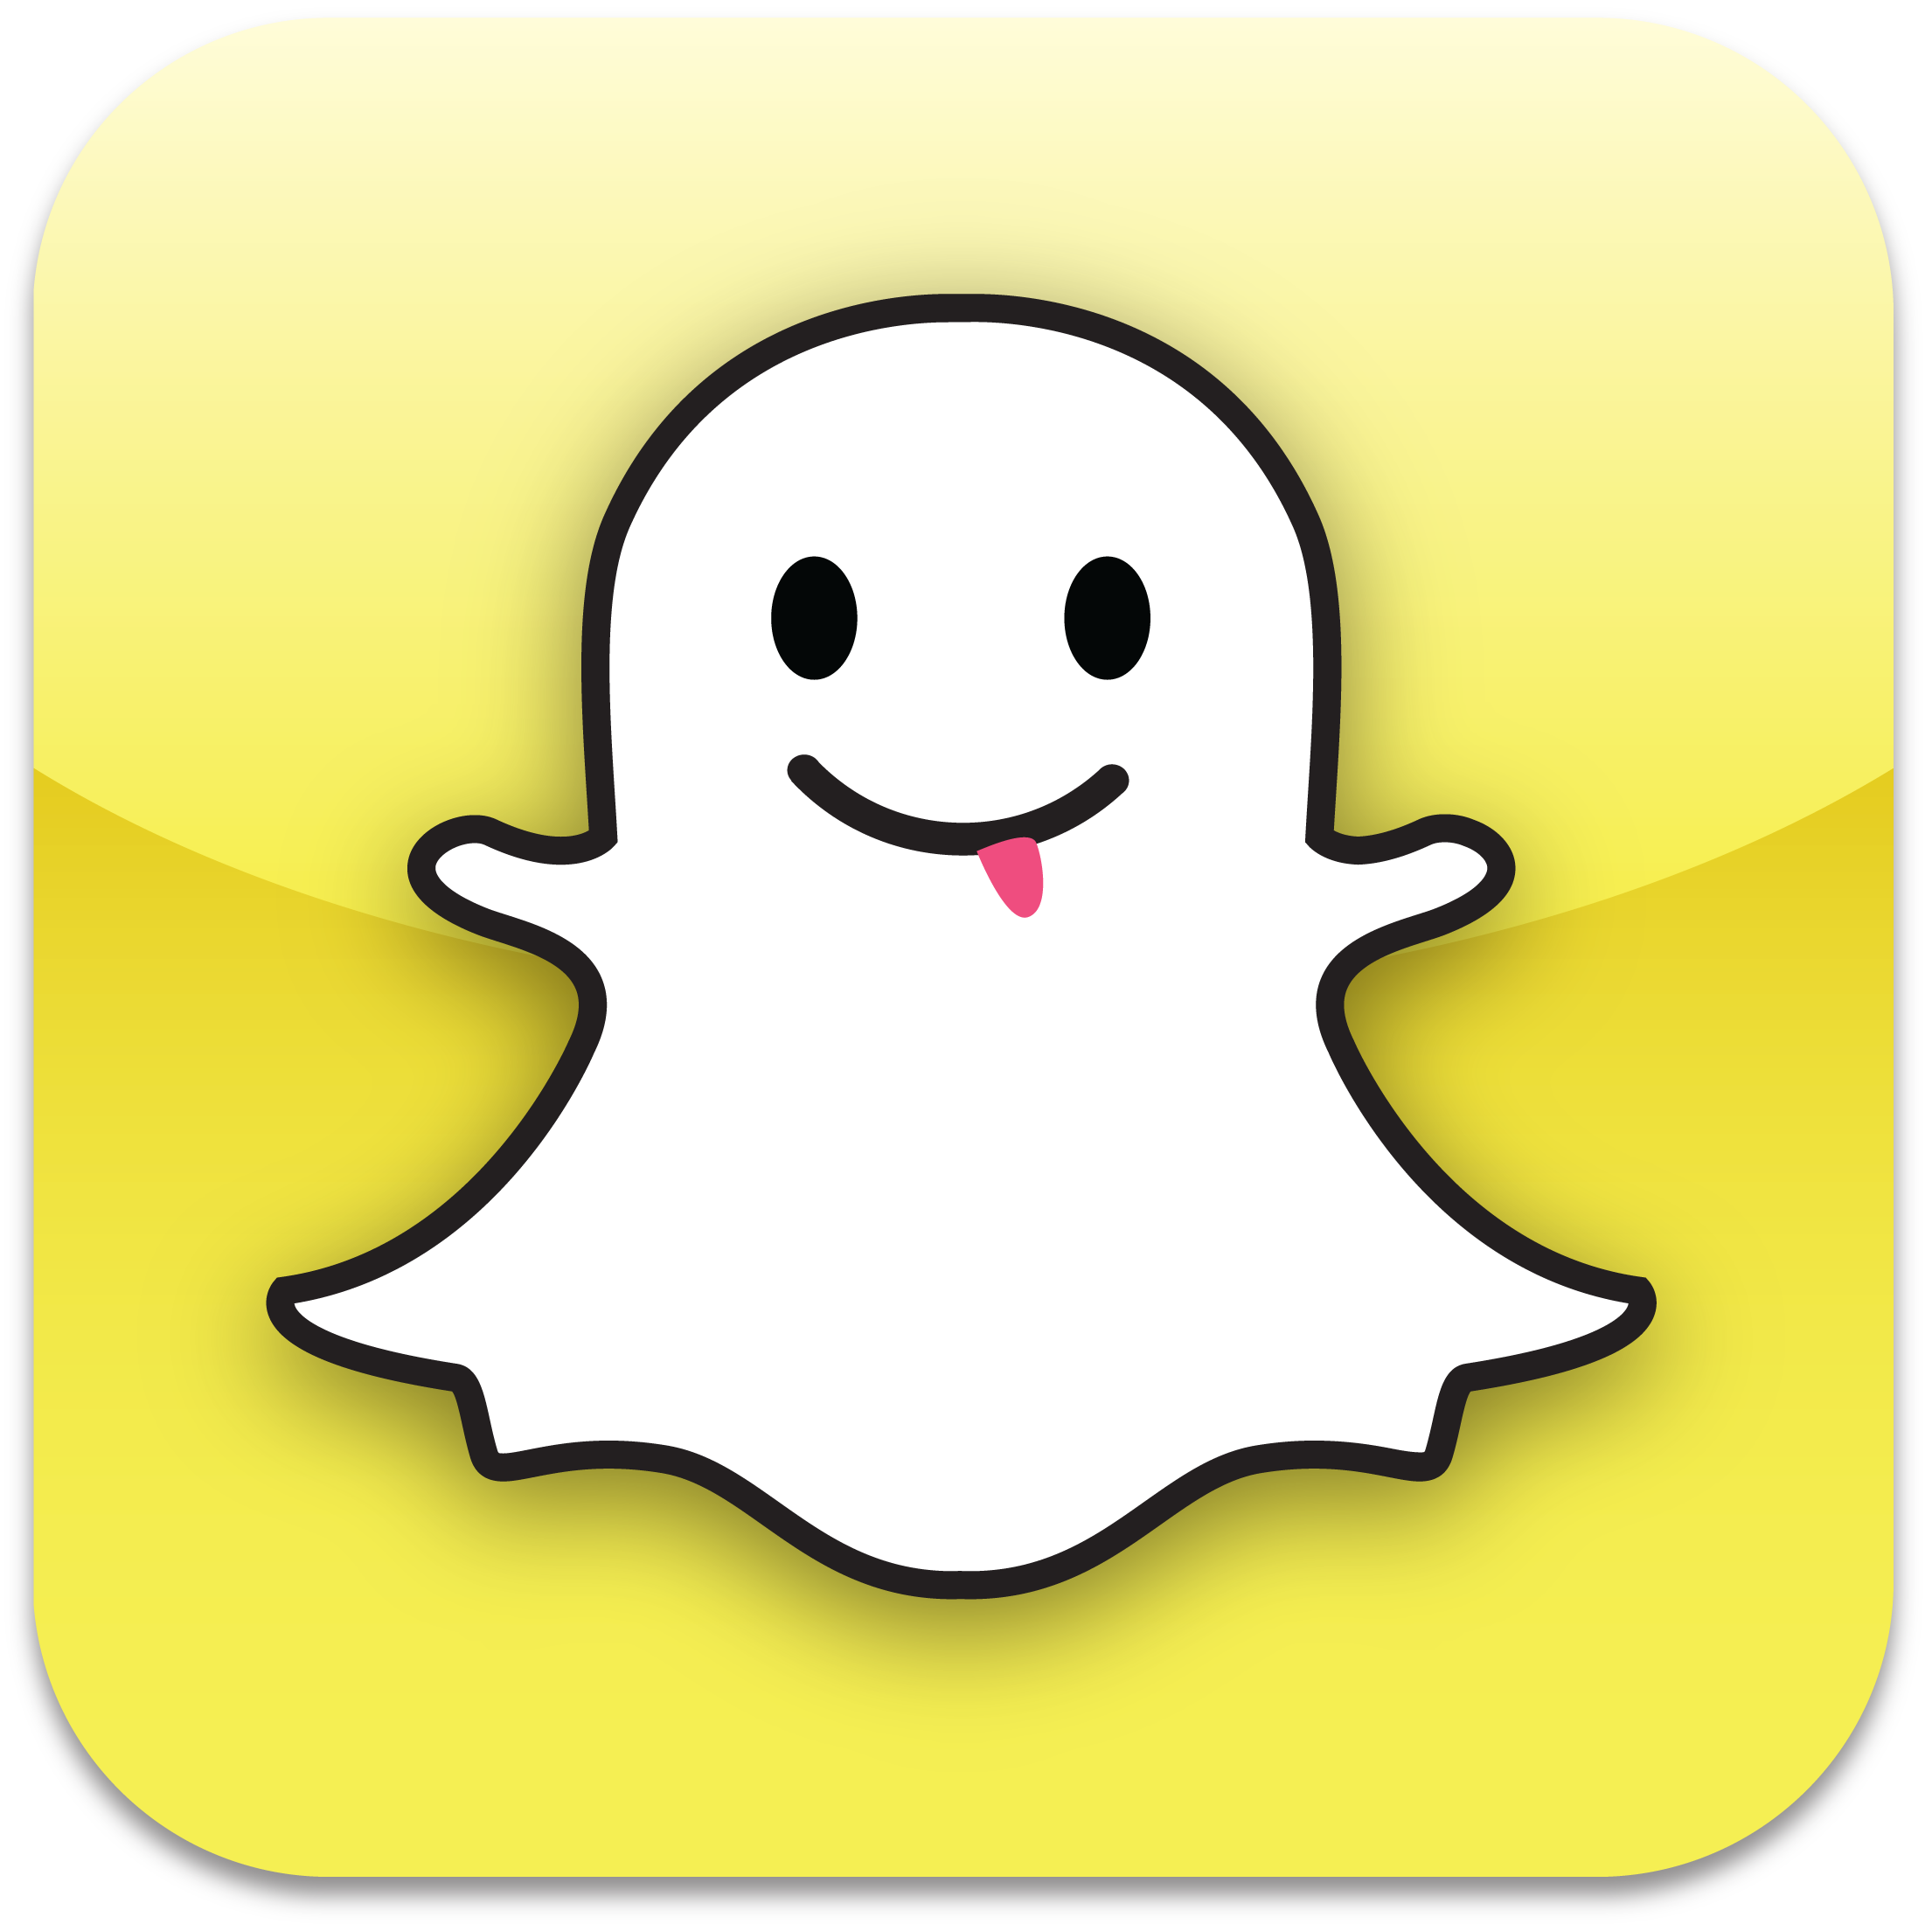 2210x2209 Snapchat Phone Clip Art Cliparts